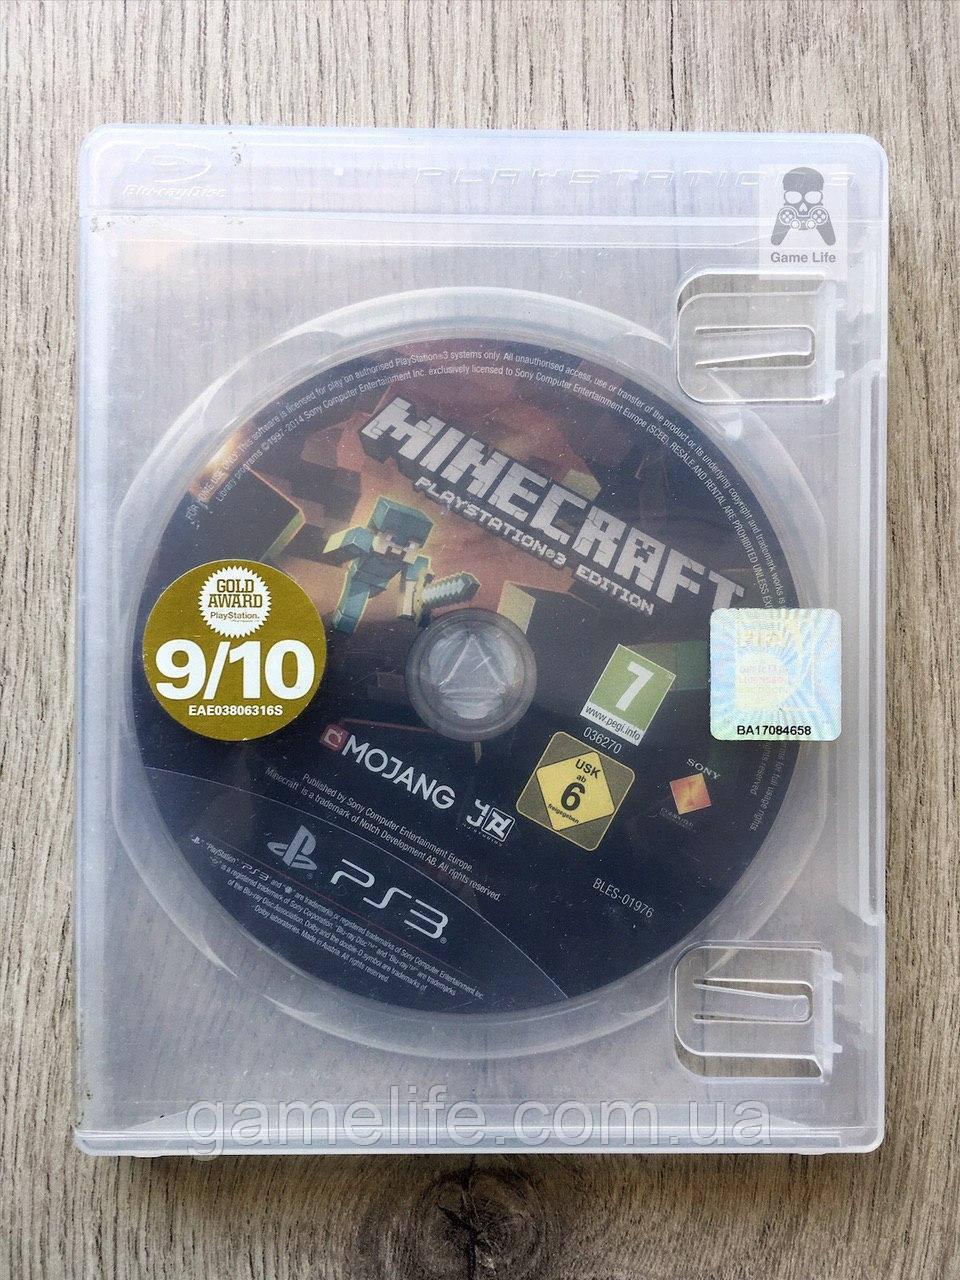 Minecraft (без коробки) (рус.) (б/у) PS3